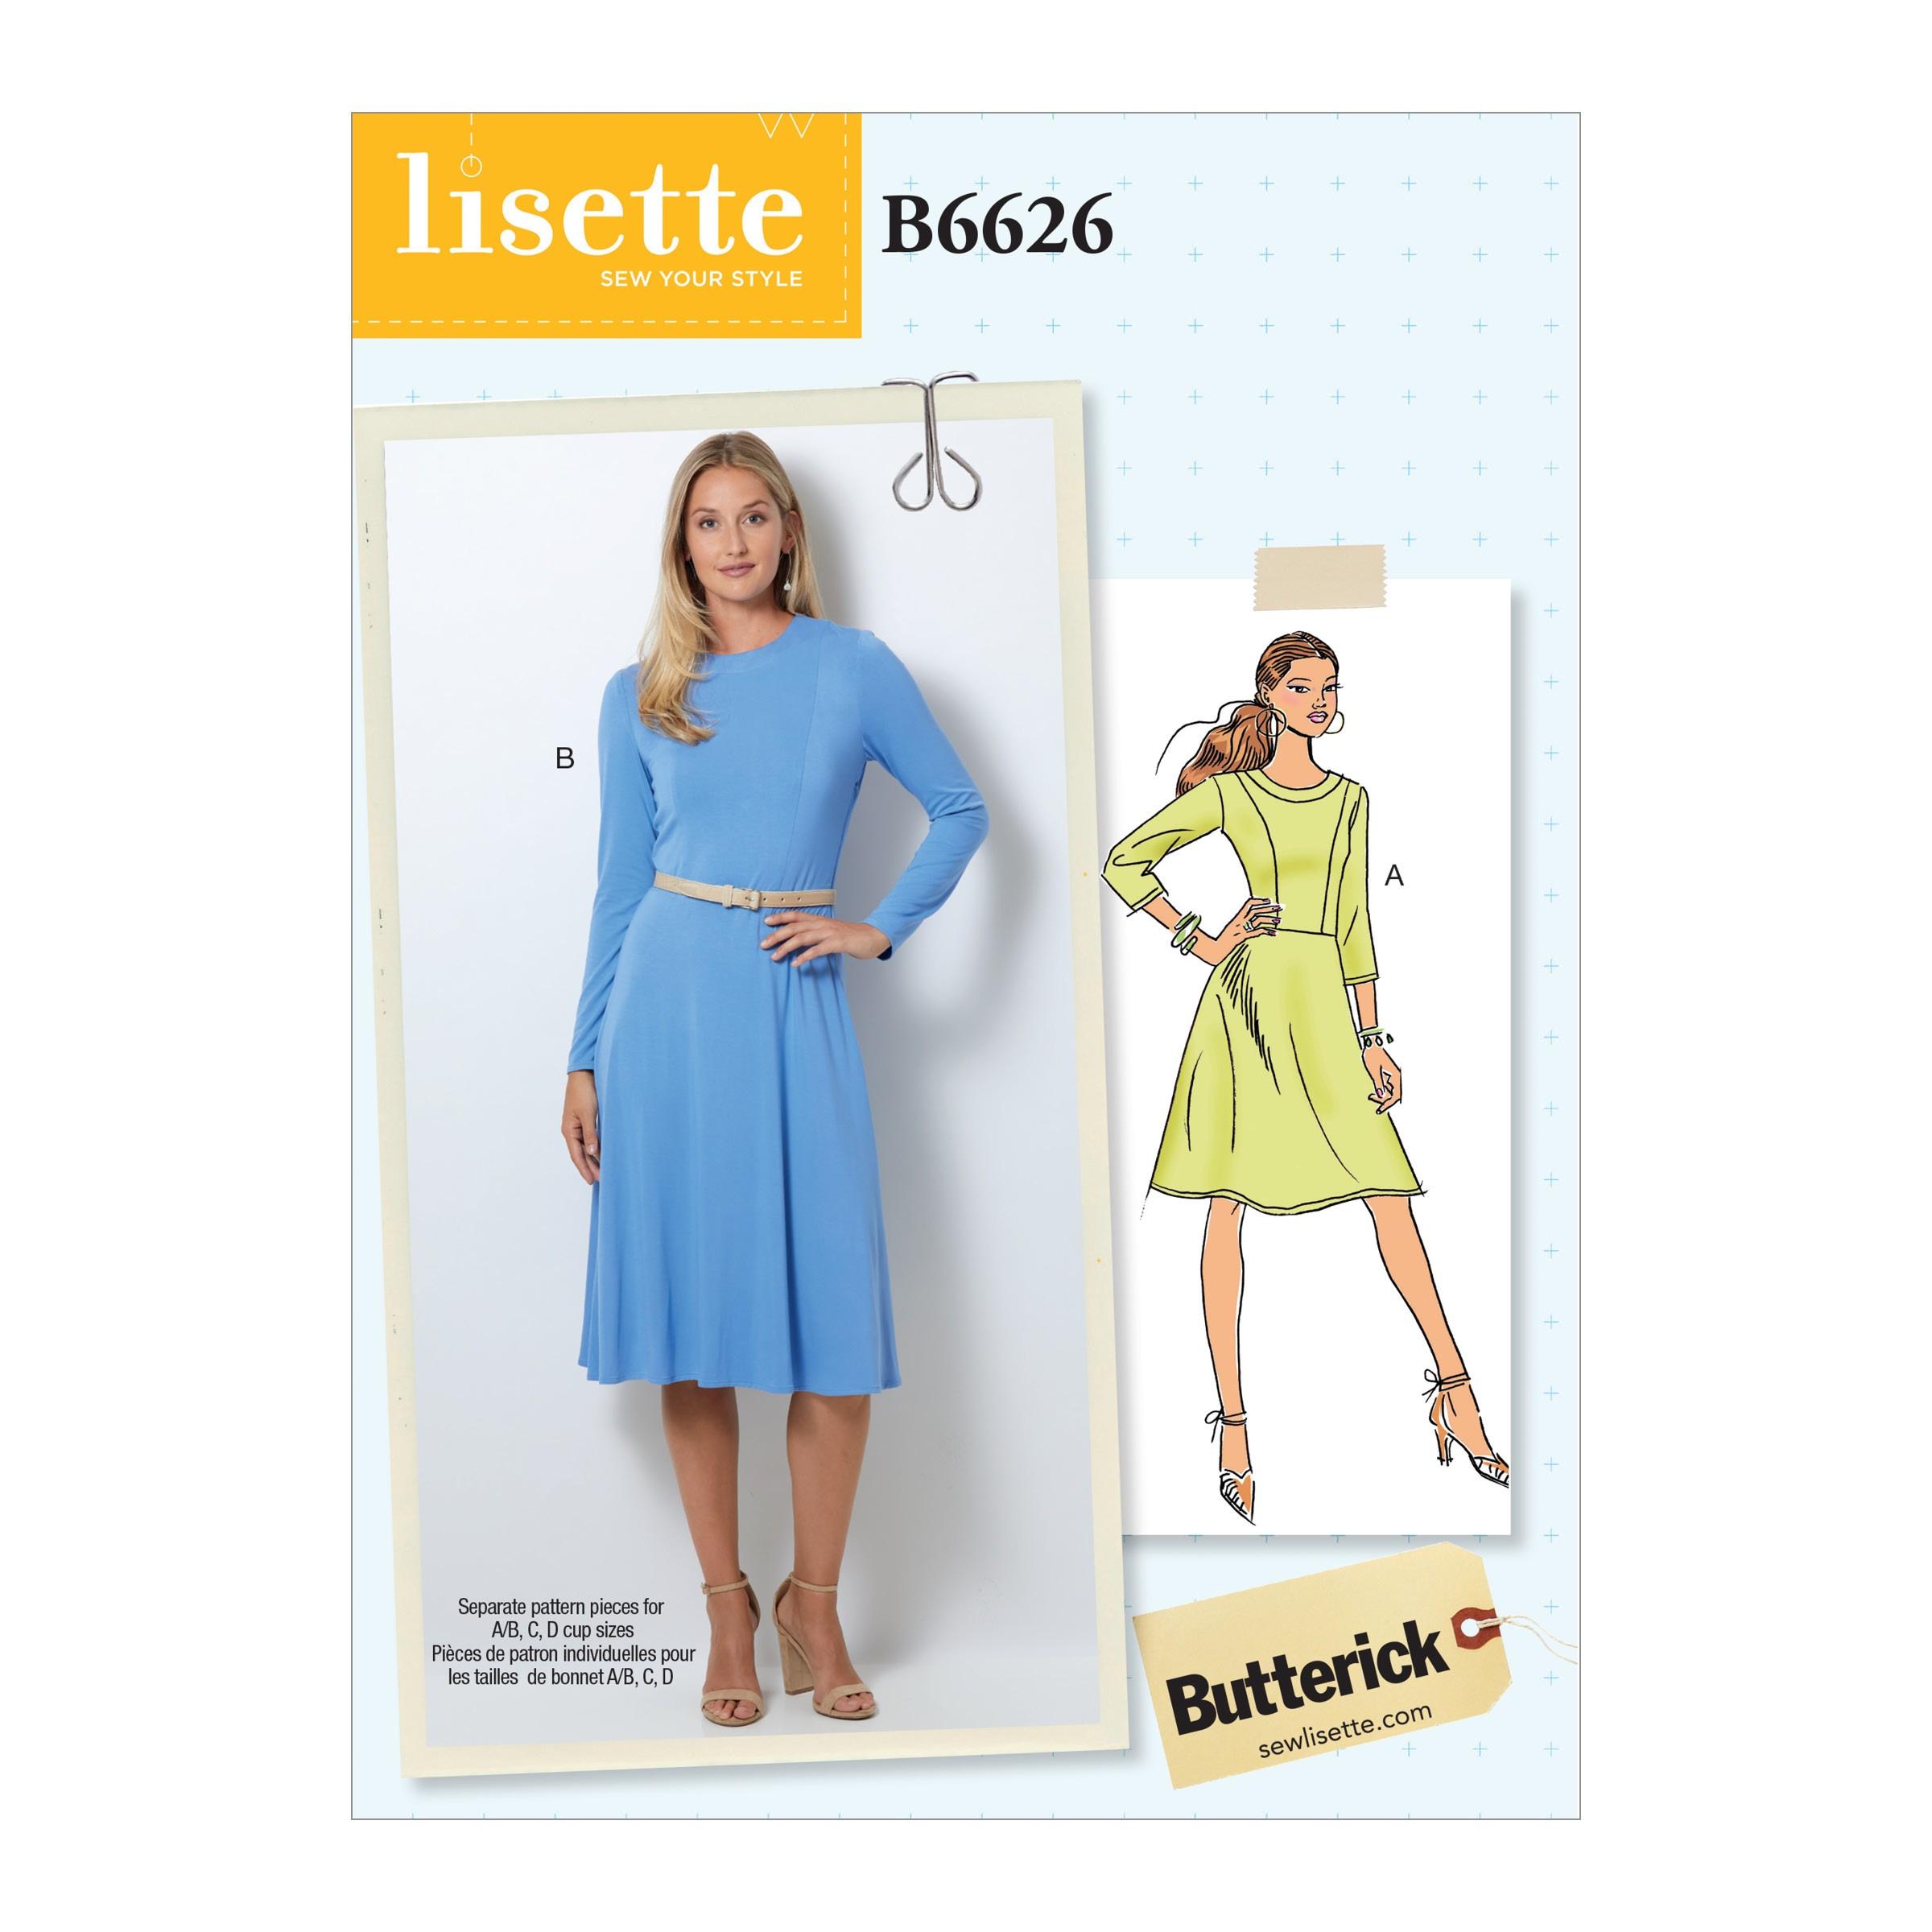 Butterick Sewing Pattern 6626 Women's Petite Dress